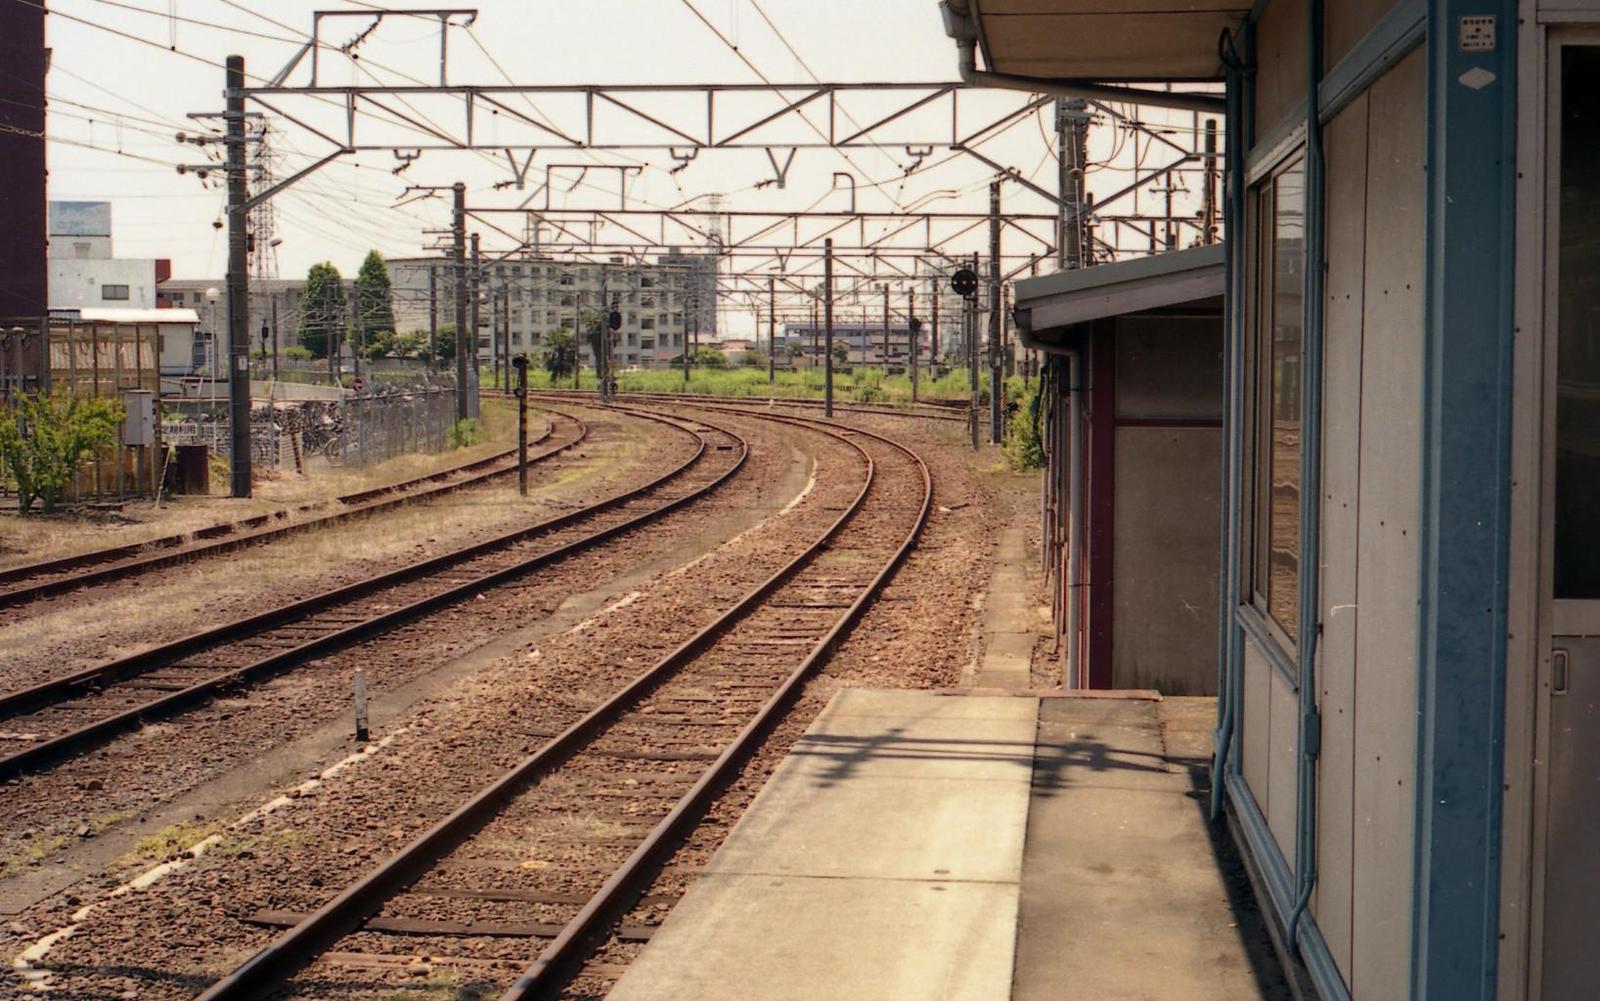 20020526a60